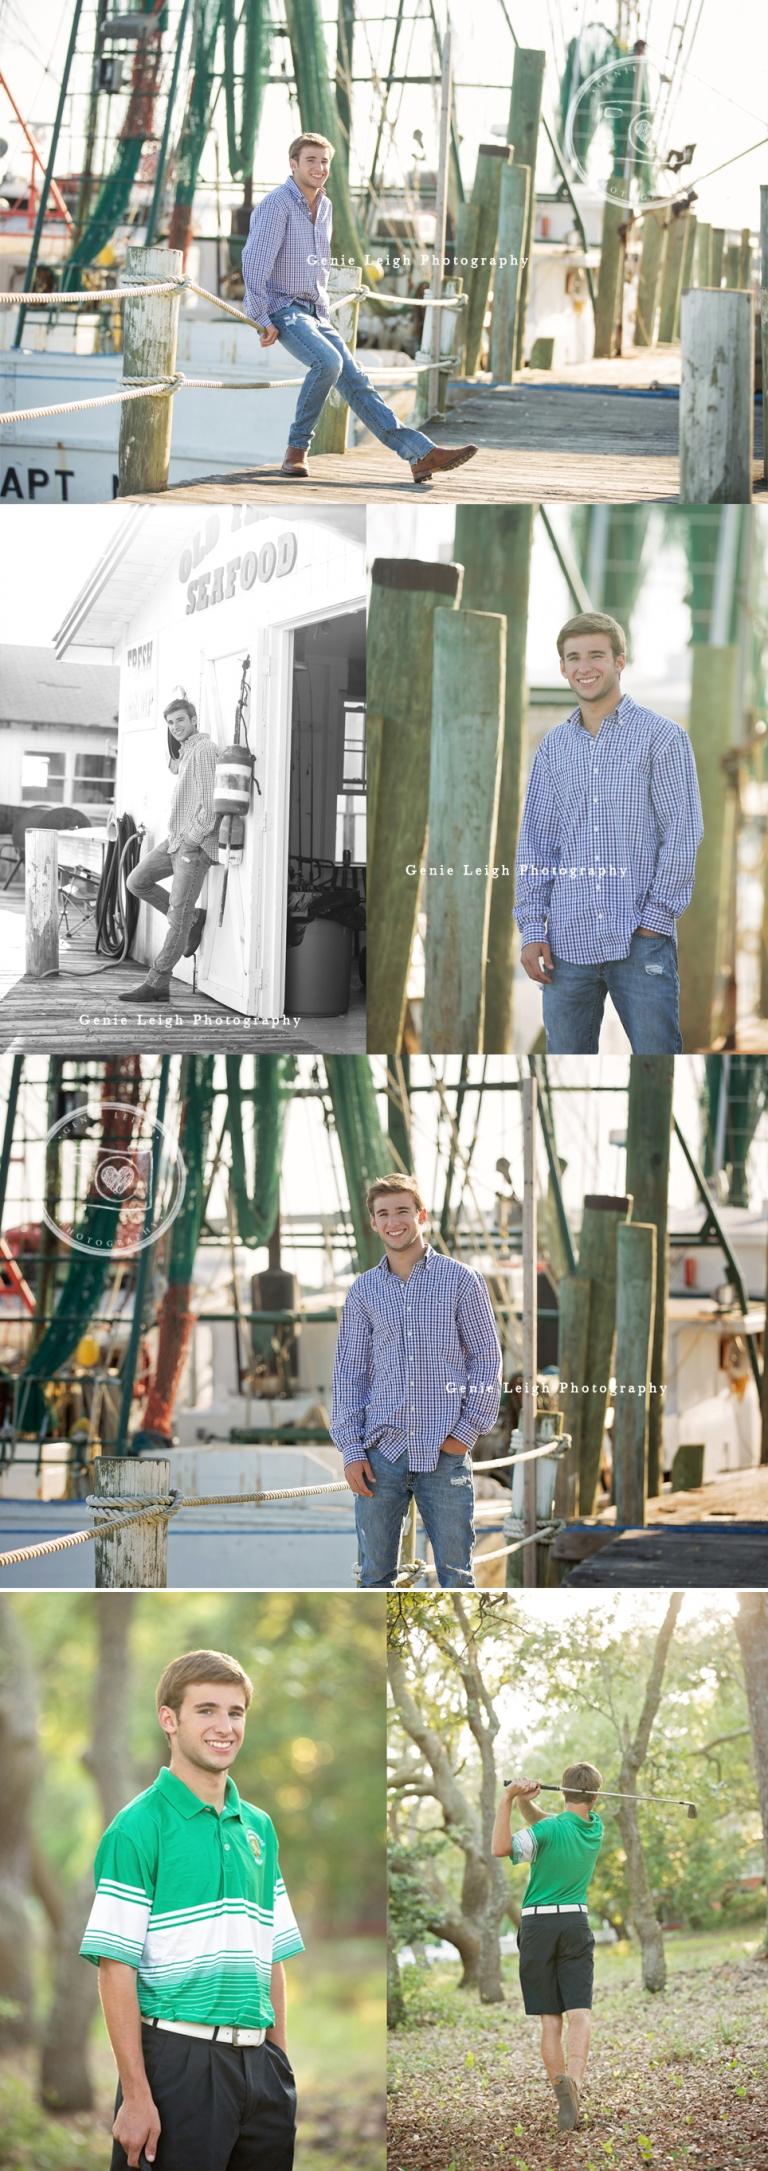 Drew Senior Portraits